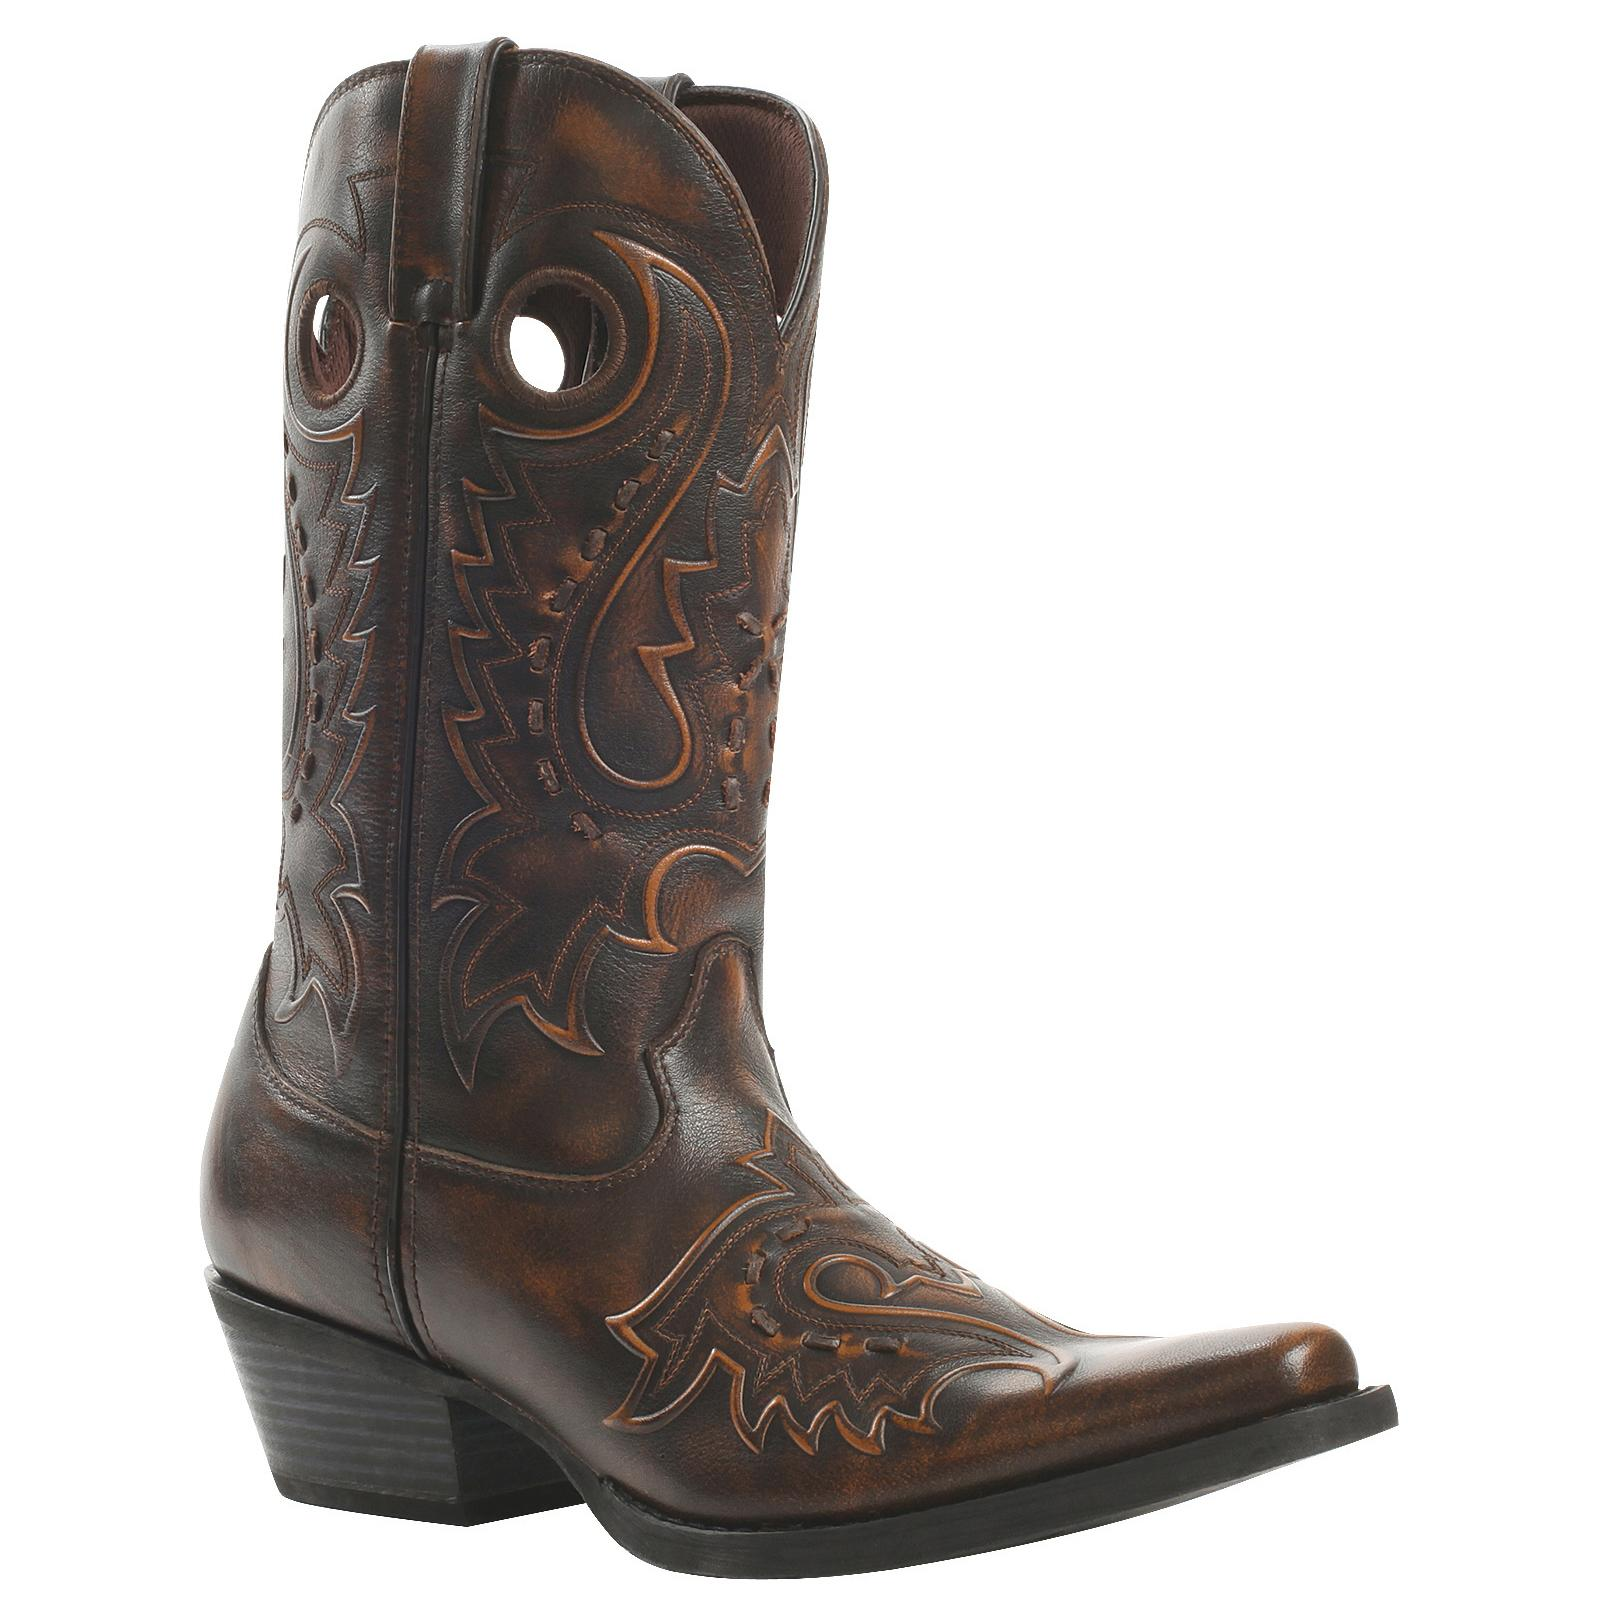 gambler by durango s brown western boots db5433